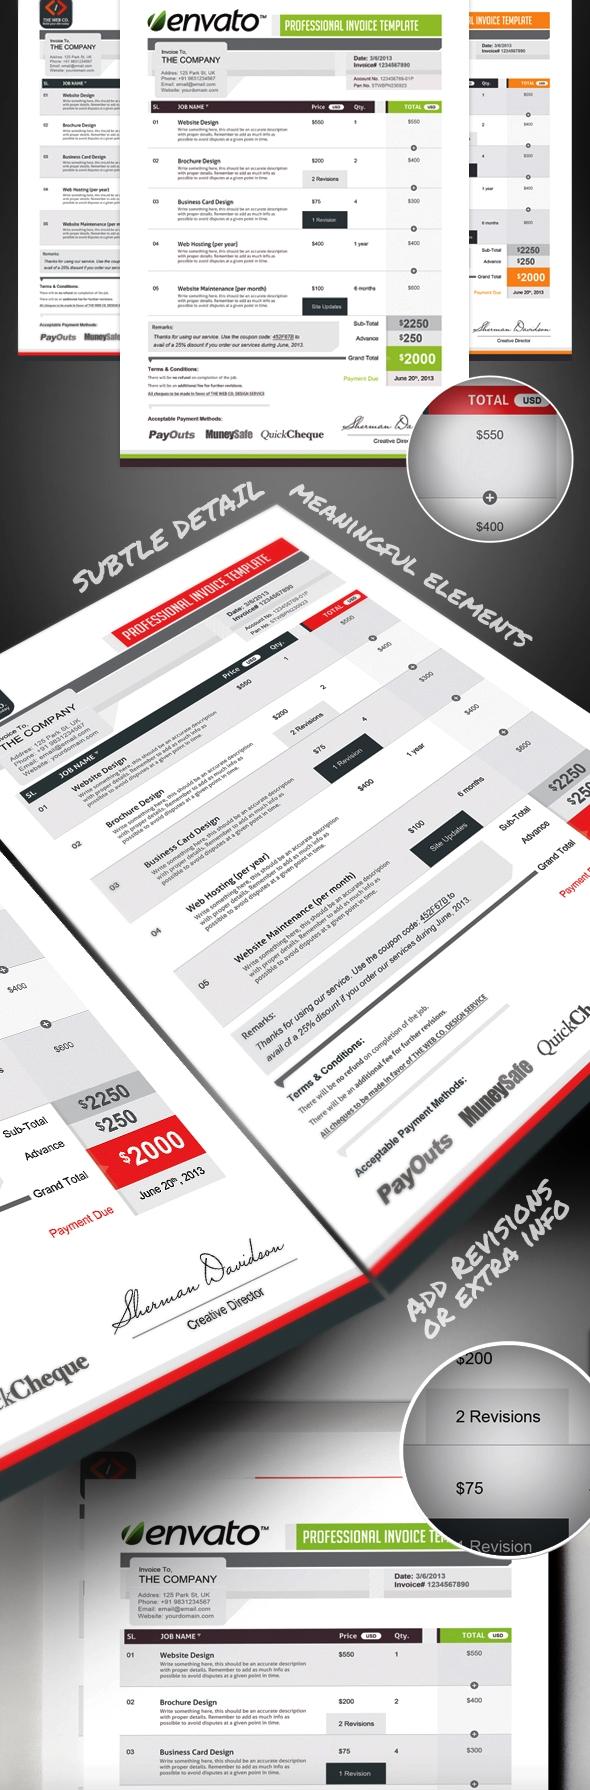 Contoh-Desain-Invoice-Surat-Tagihan-Bisnis-Perusahaan-06